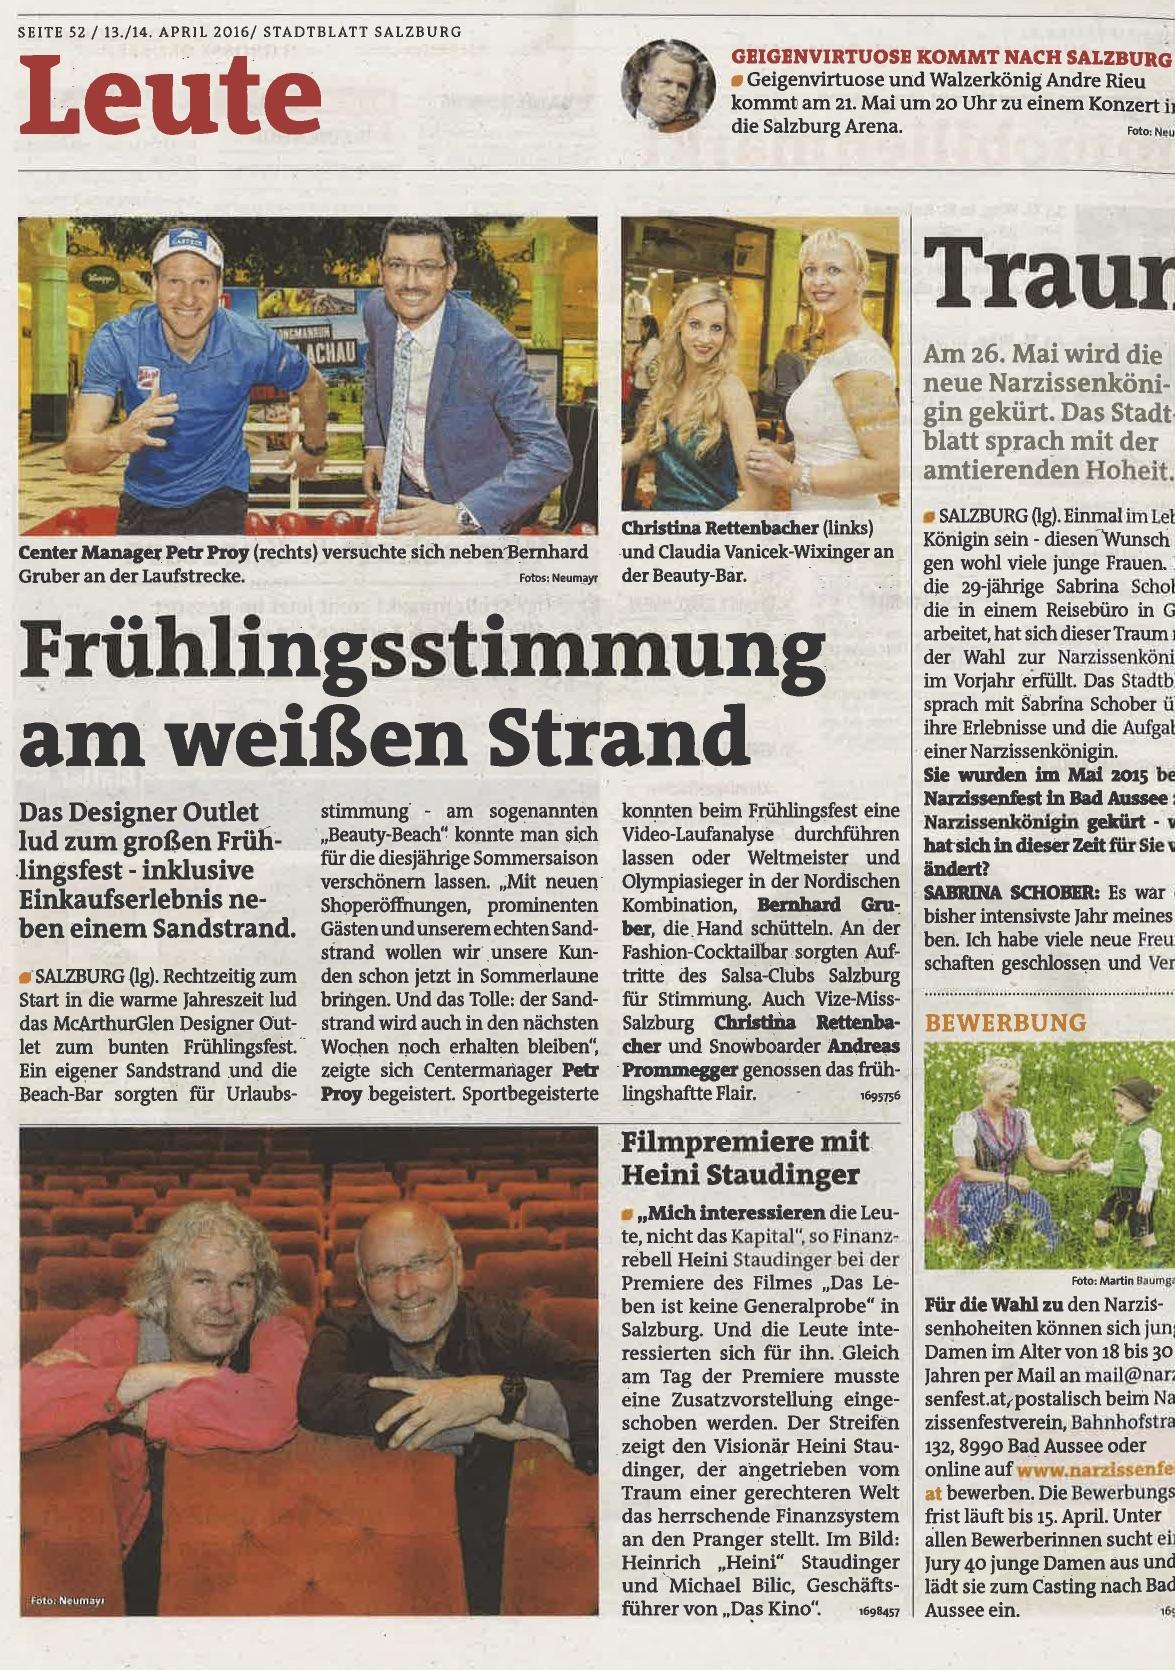 Stadtblatt, 13. April 2016